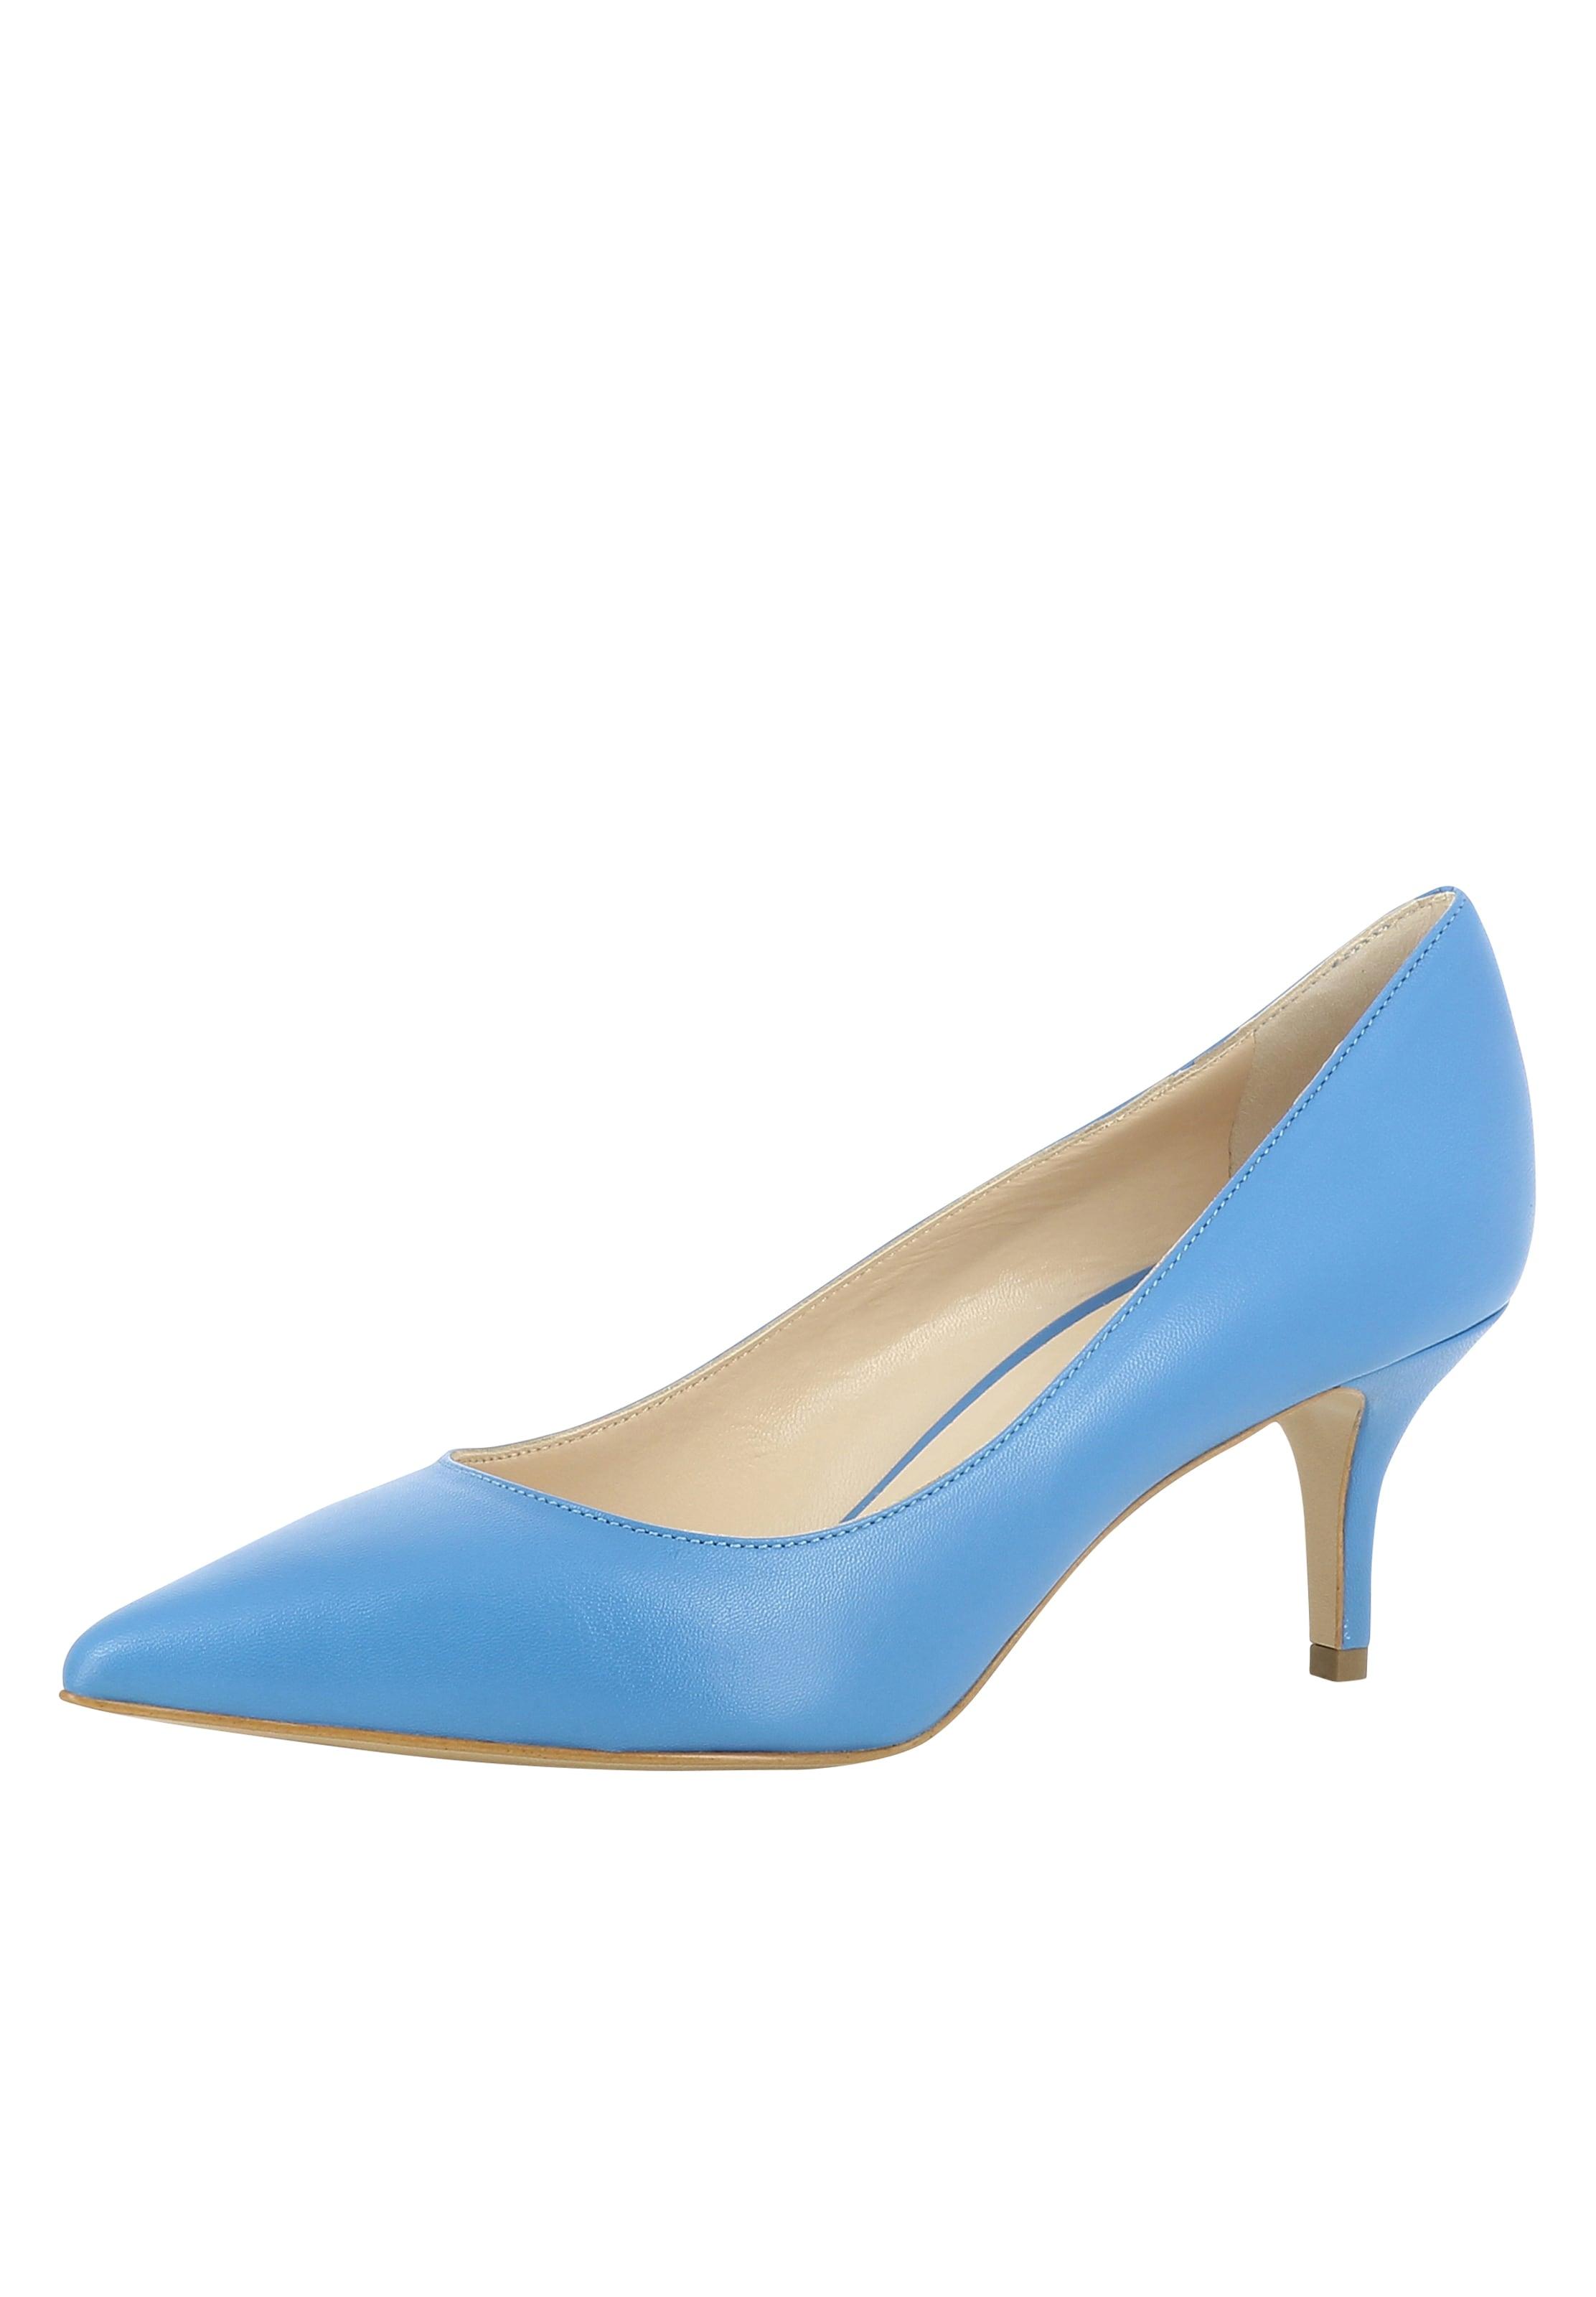 In Pumps Pumps 'giulia' Evita Evita Pumps 'giulia' 'giulia' Blau In Blau Evita dBstoQrCxh